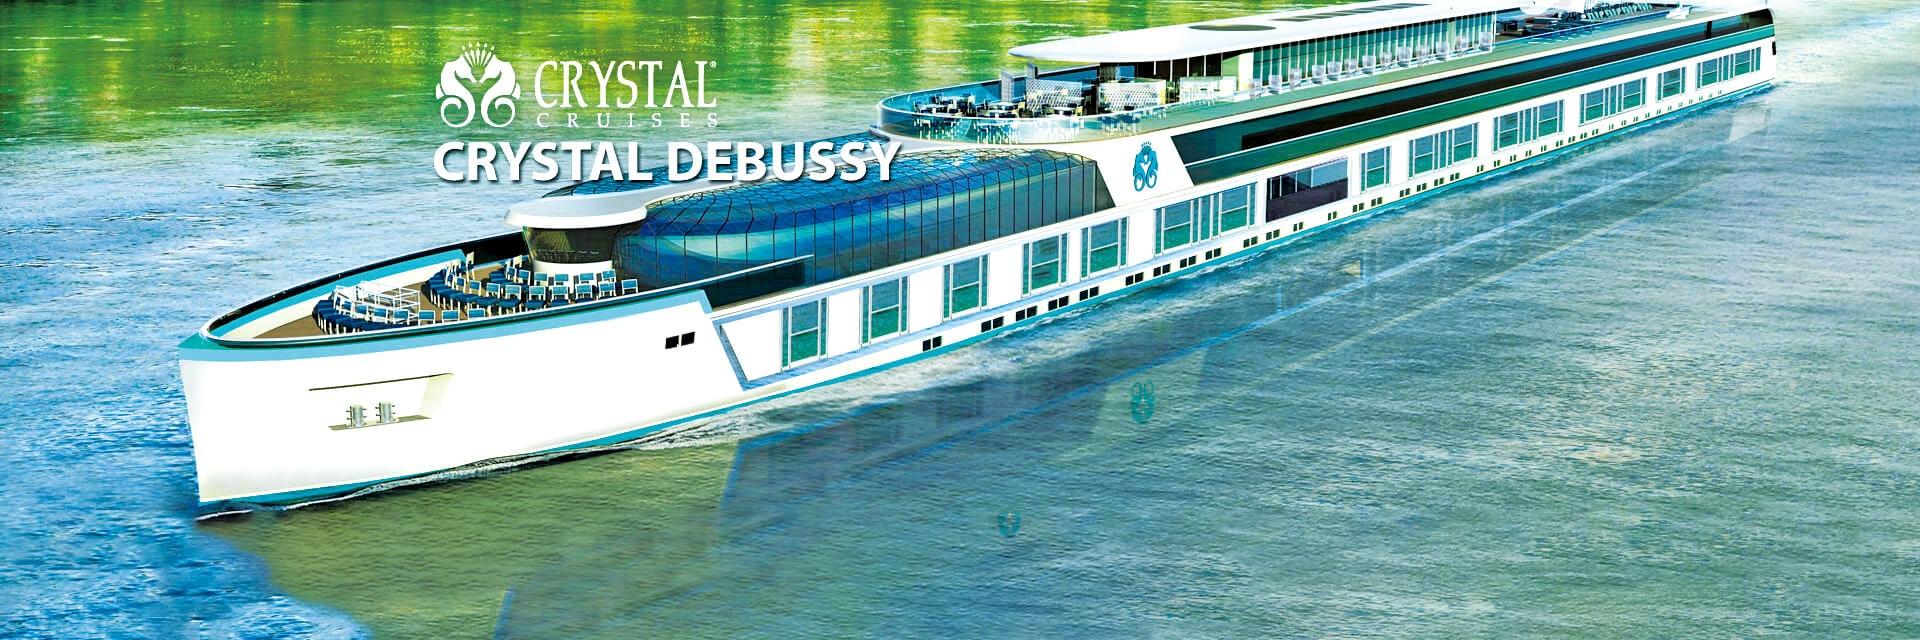 水晶河輪德布西號Crystal Debussy